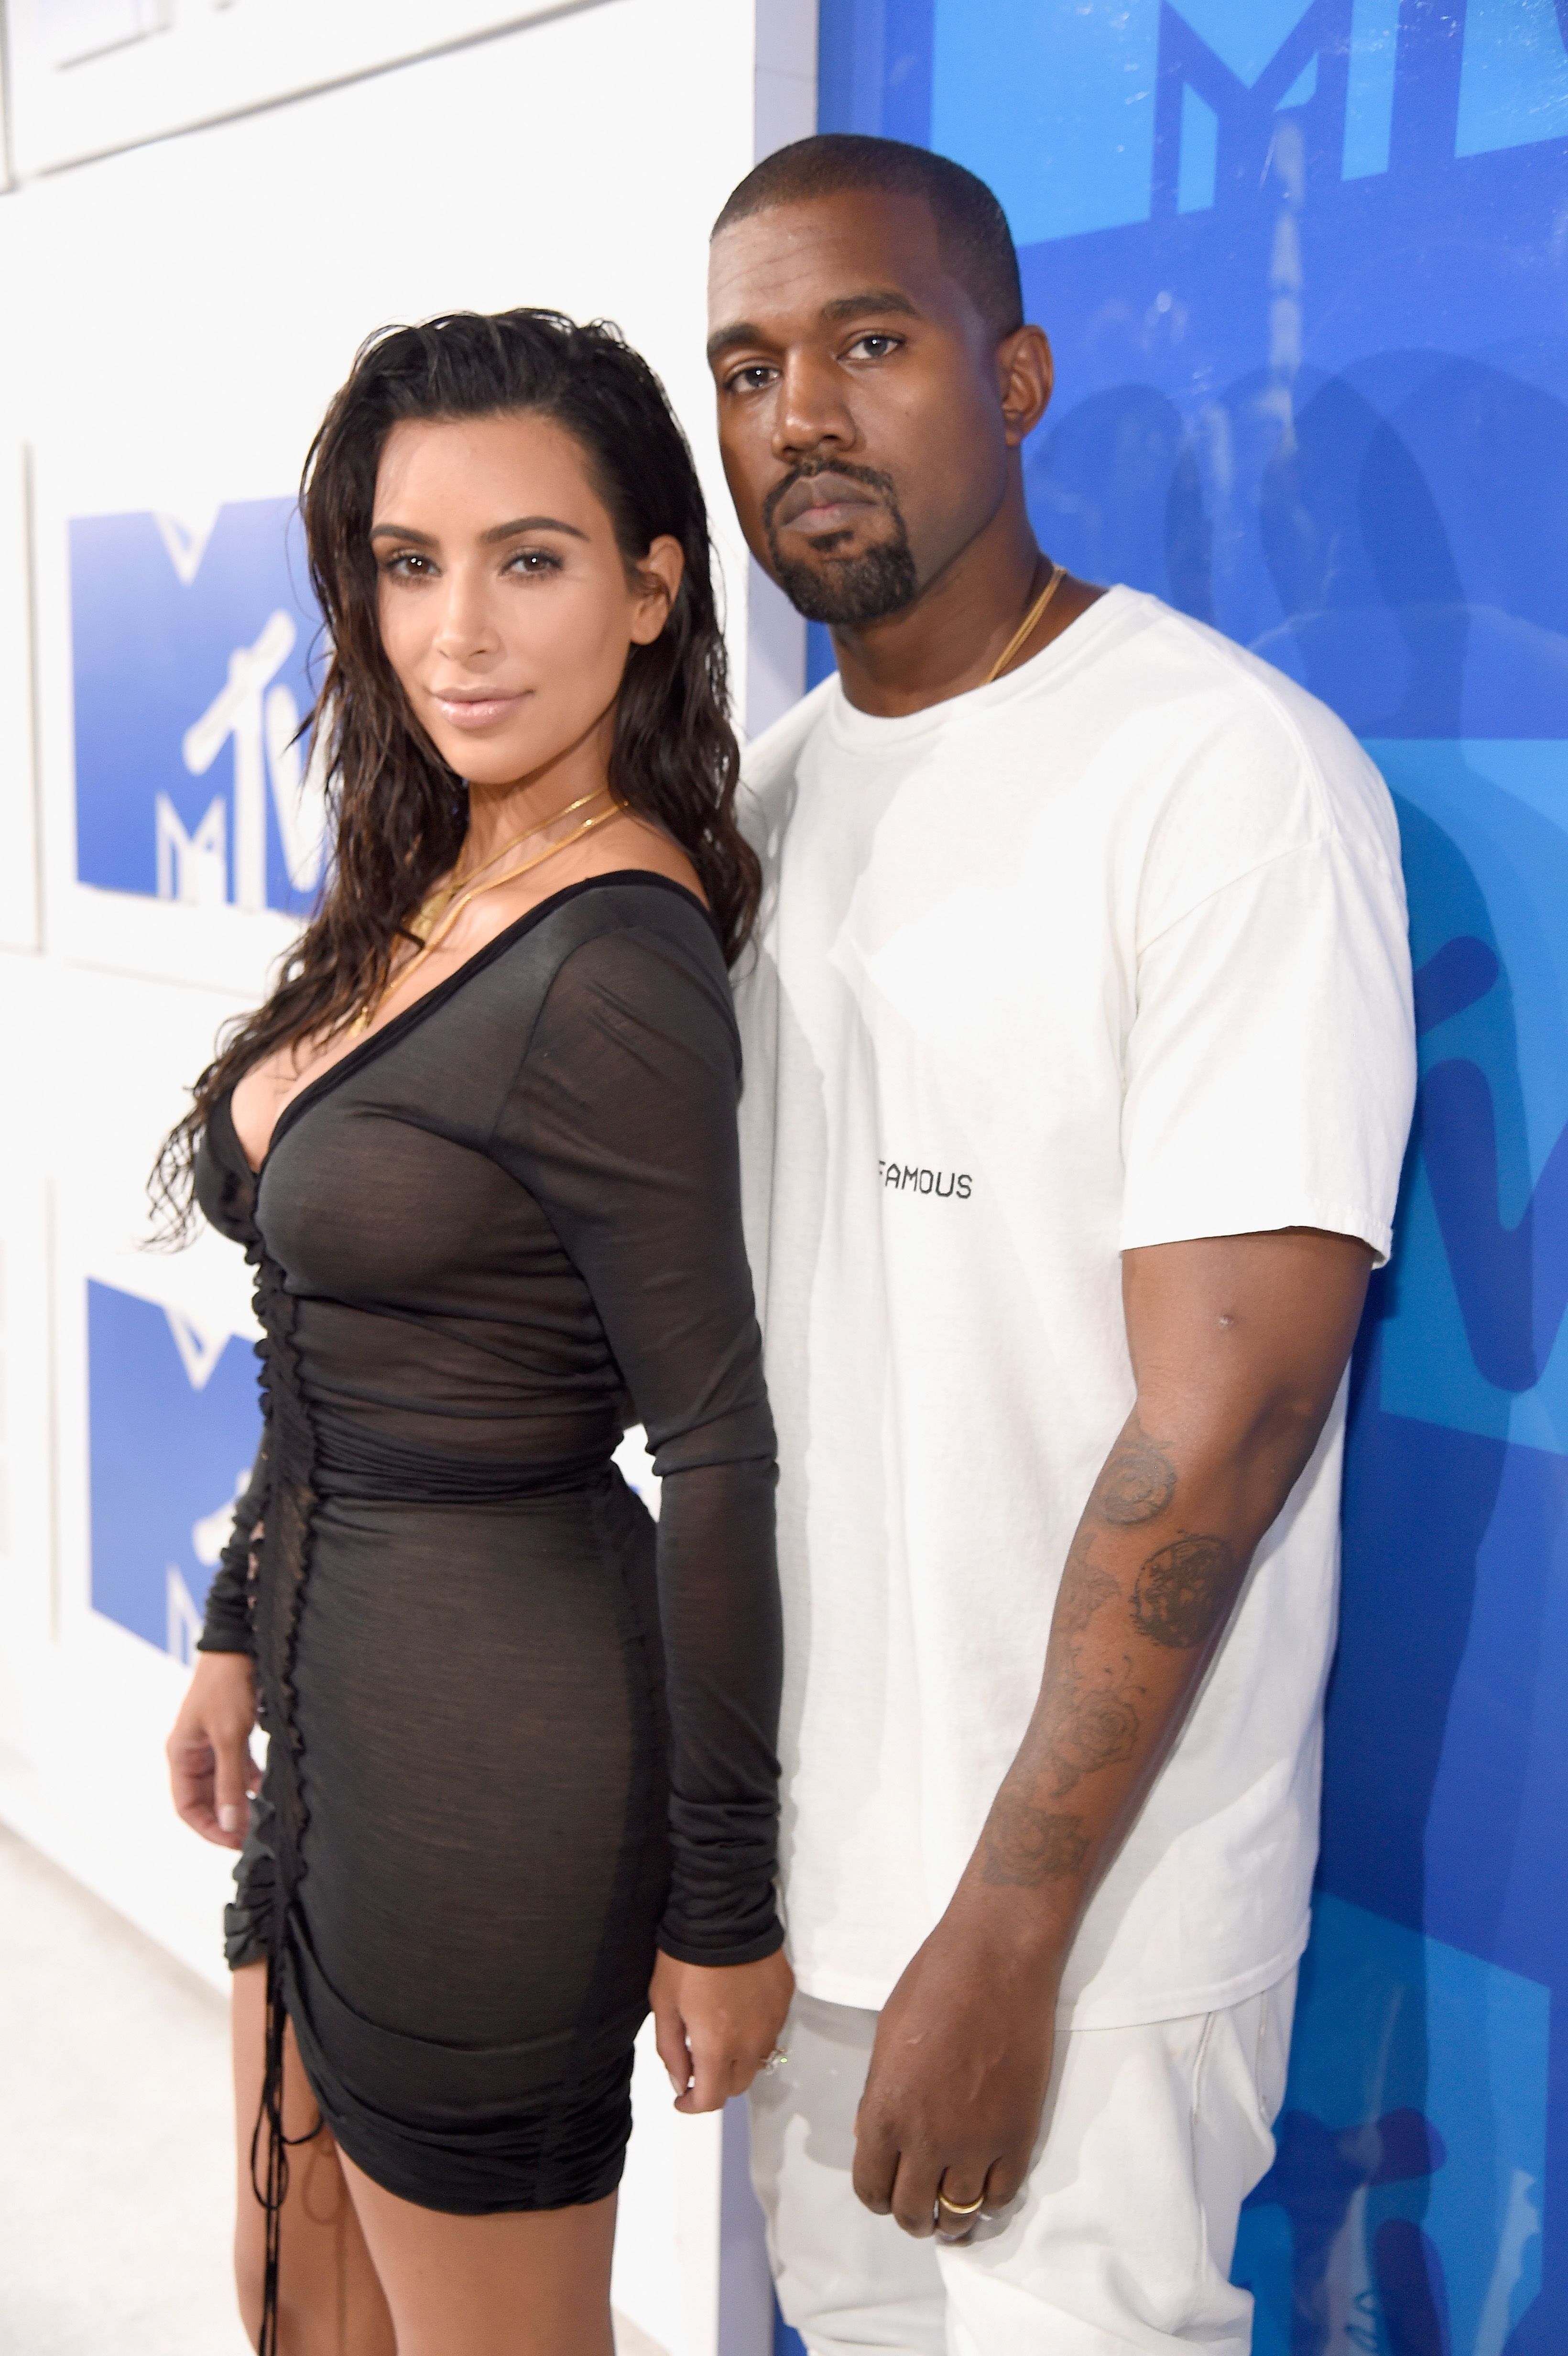 How old was kim kardashian when she started dating kanye